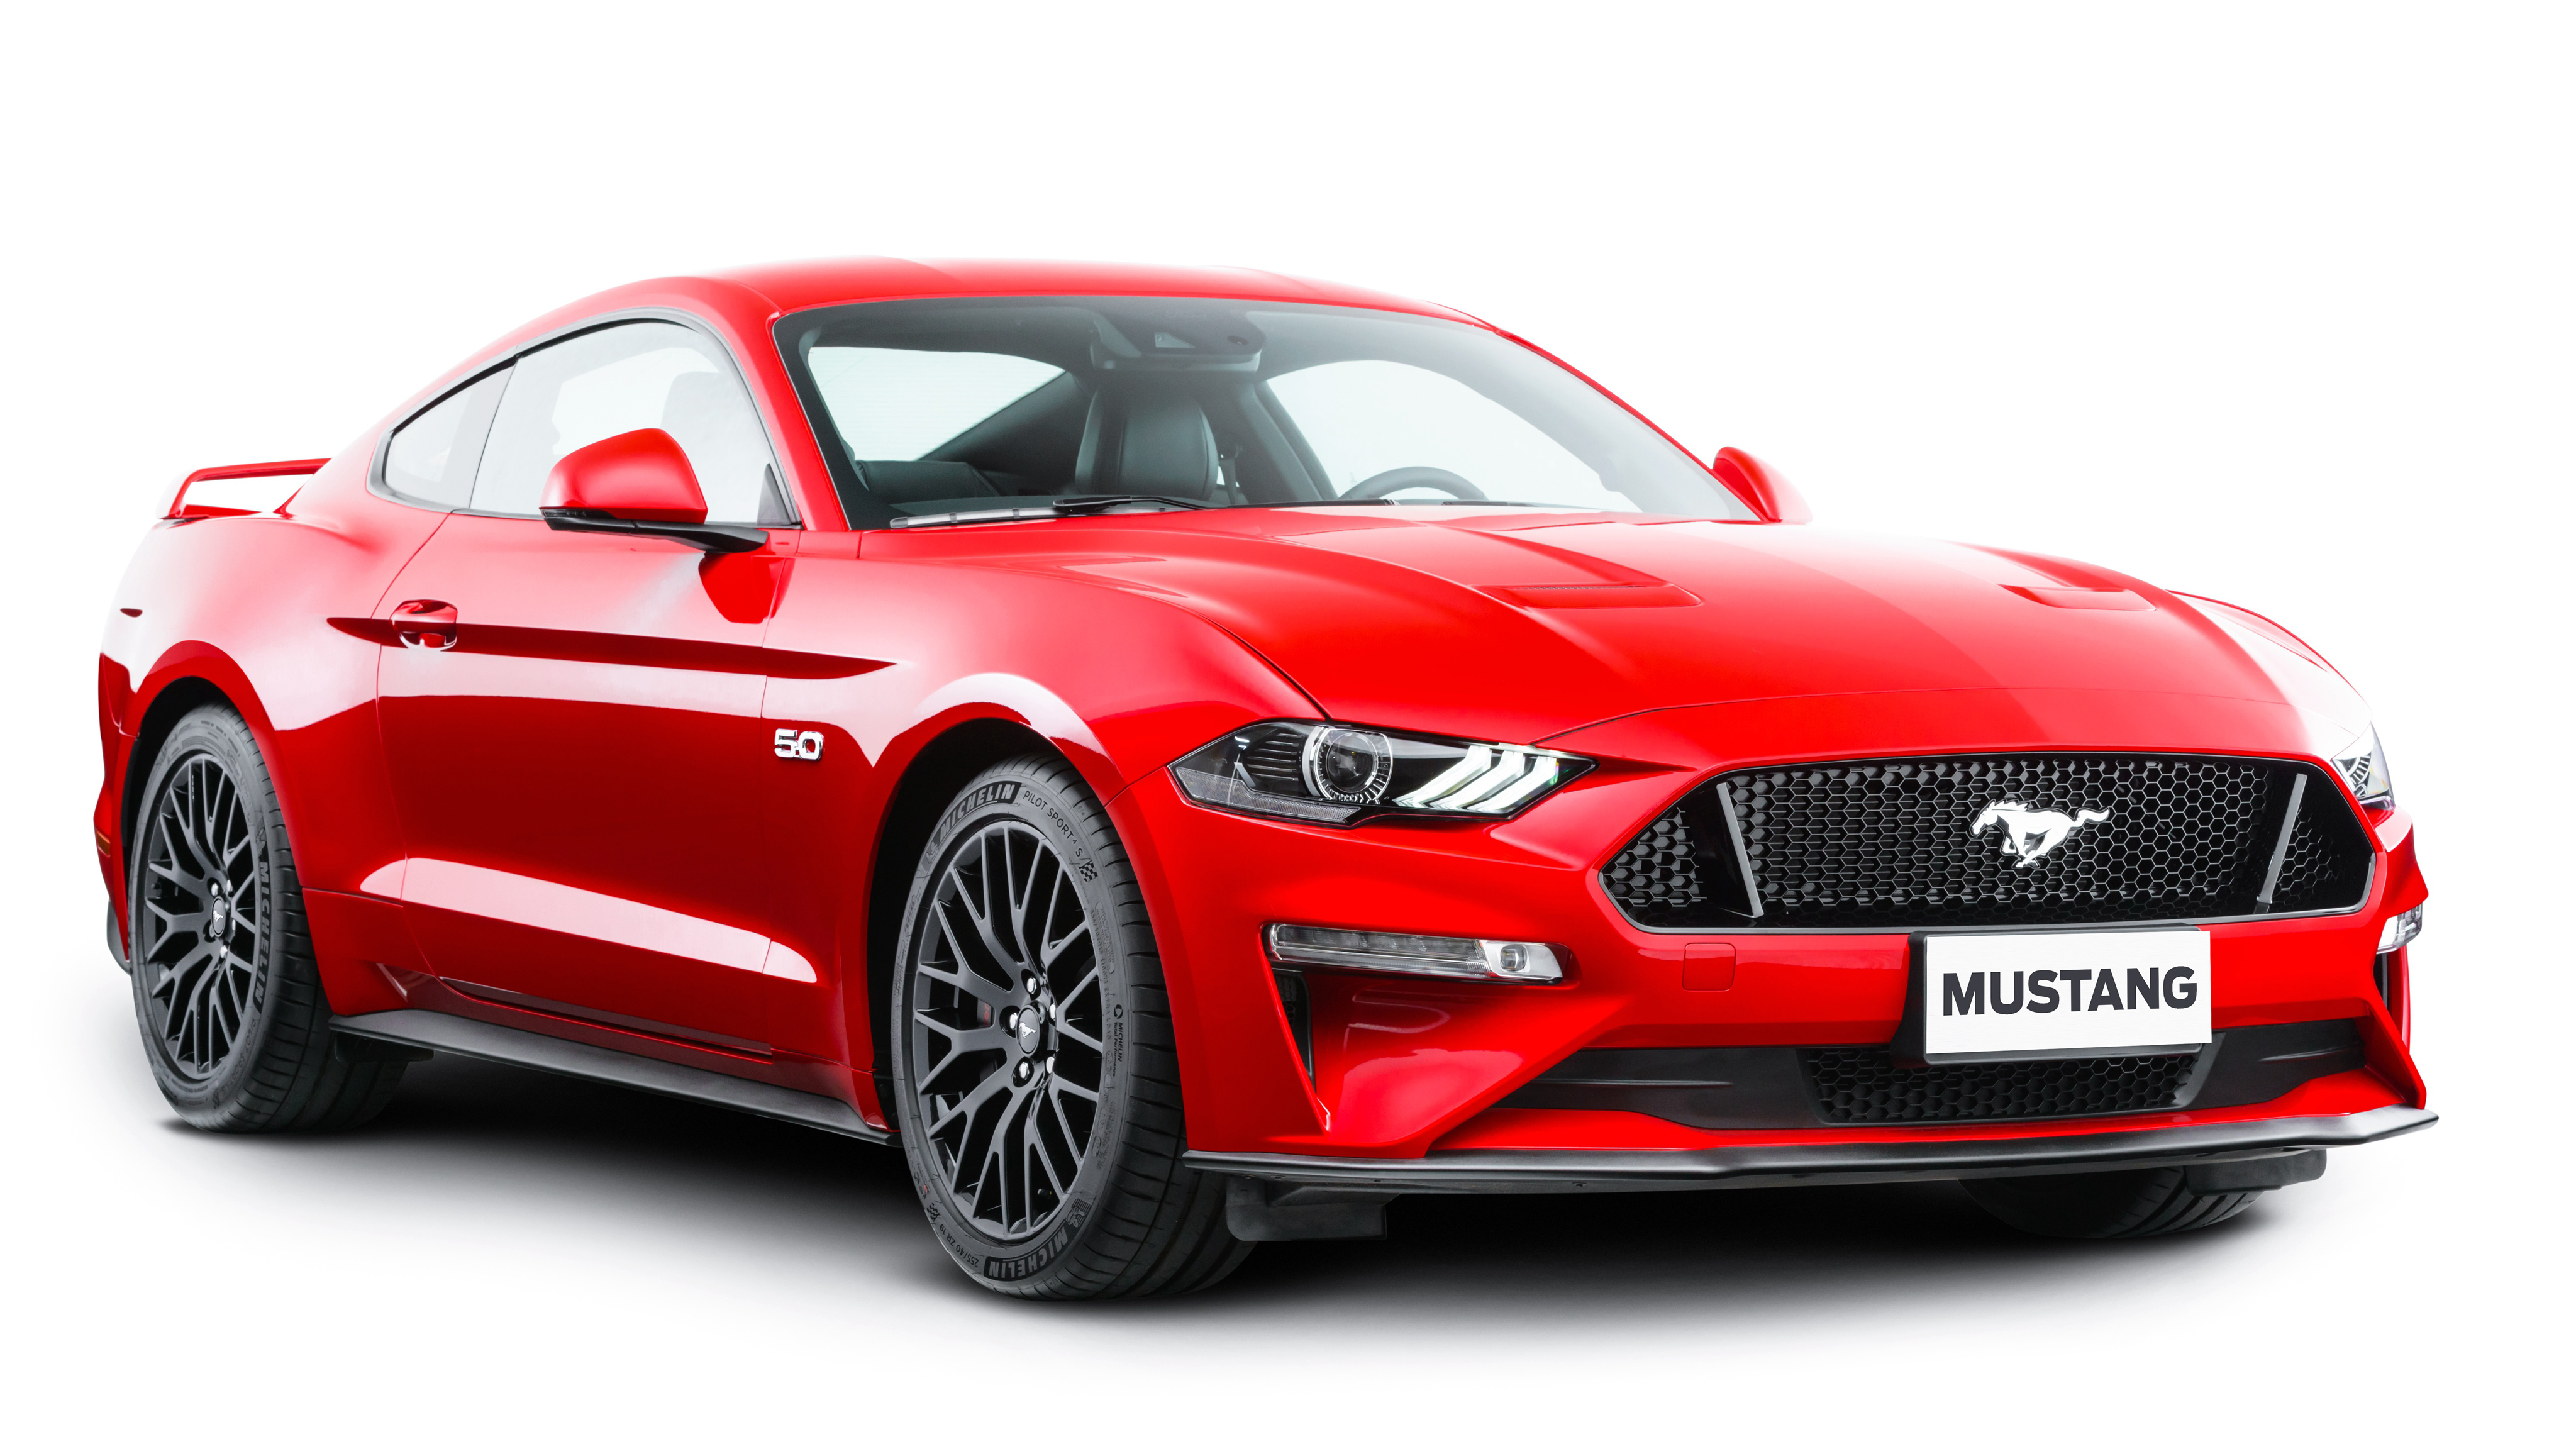 2018 ford mustang gt fastback 4k 9 wallpaper hd car